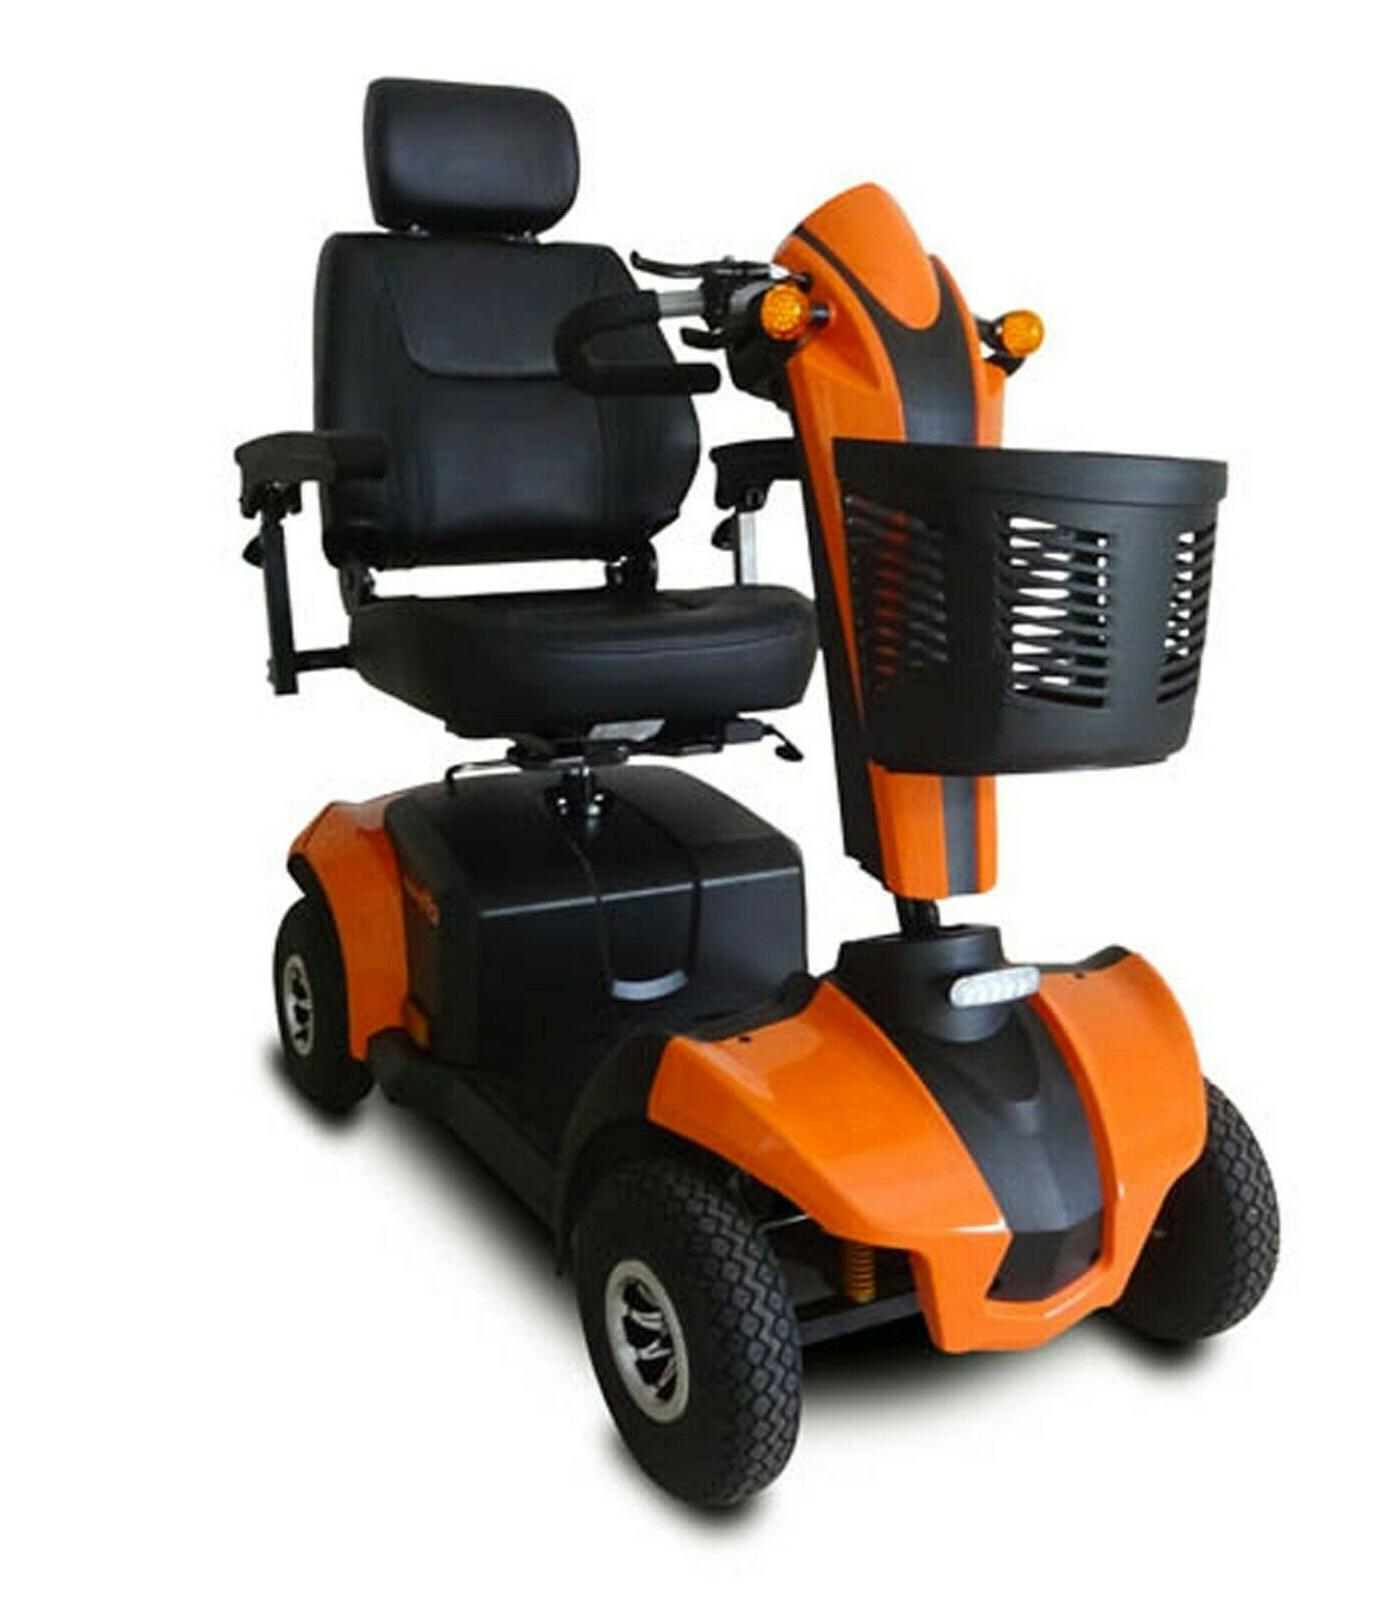 orange cityrider mobility scooter 350 lb cap